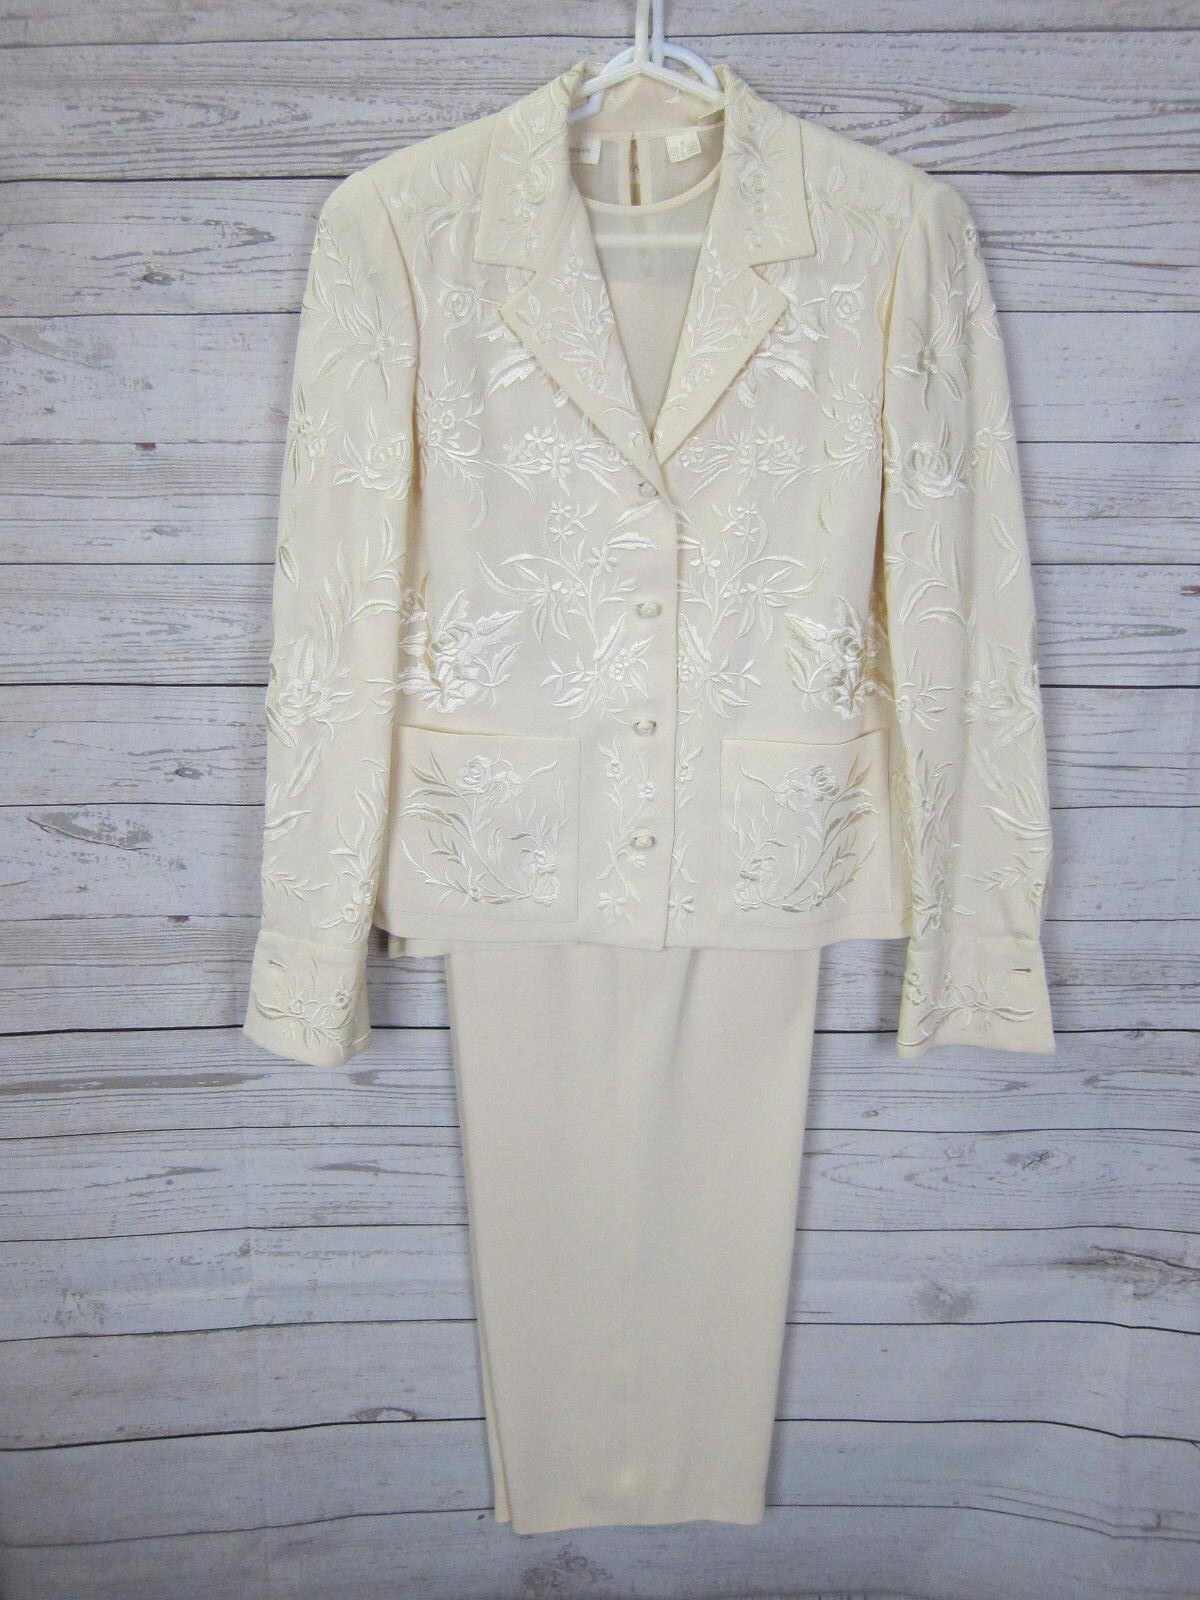 4 piezas  traje Dana Buchman Chaqueta, azulsa, Camiseta sin mangas, Pantalones De Seda Talla 10 Vintage  autentico en linea